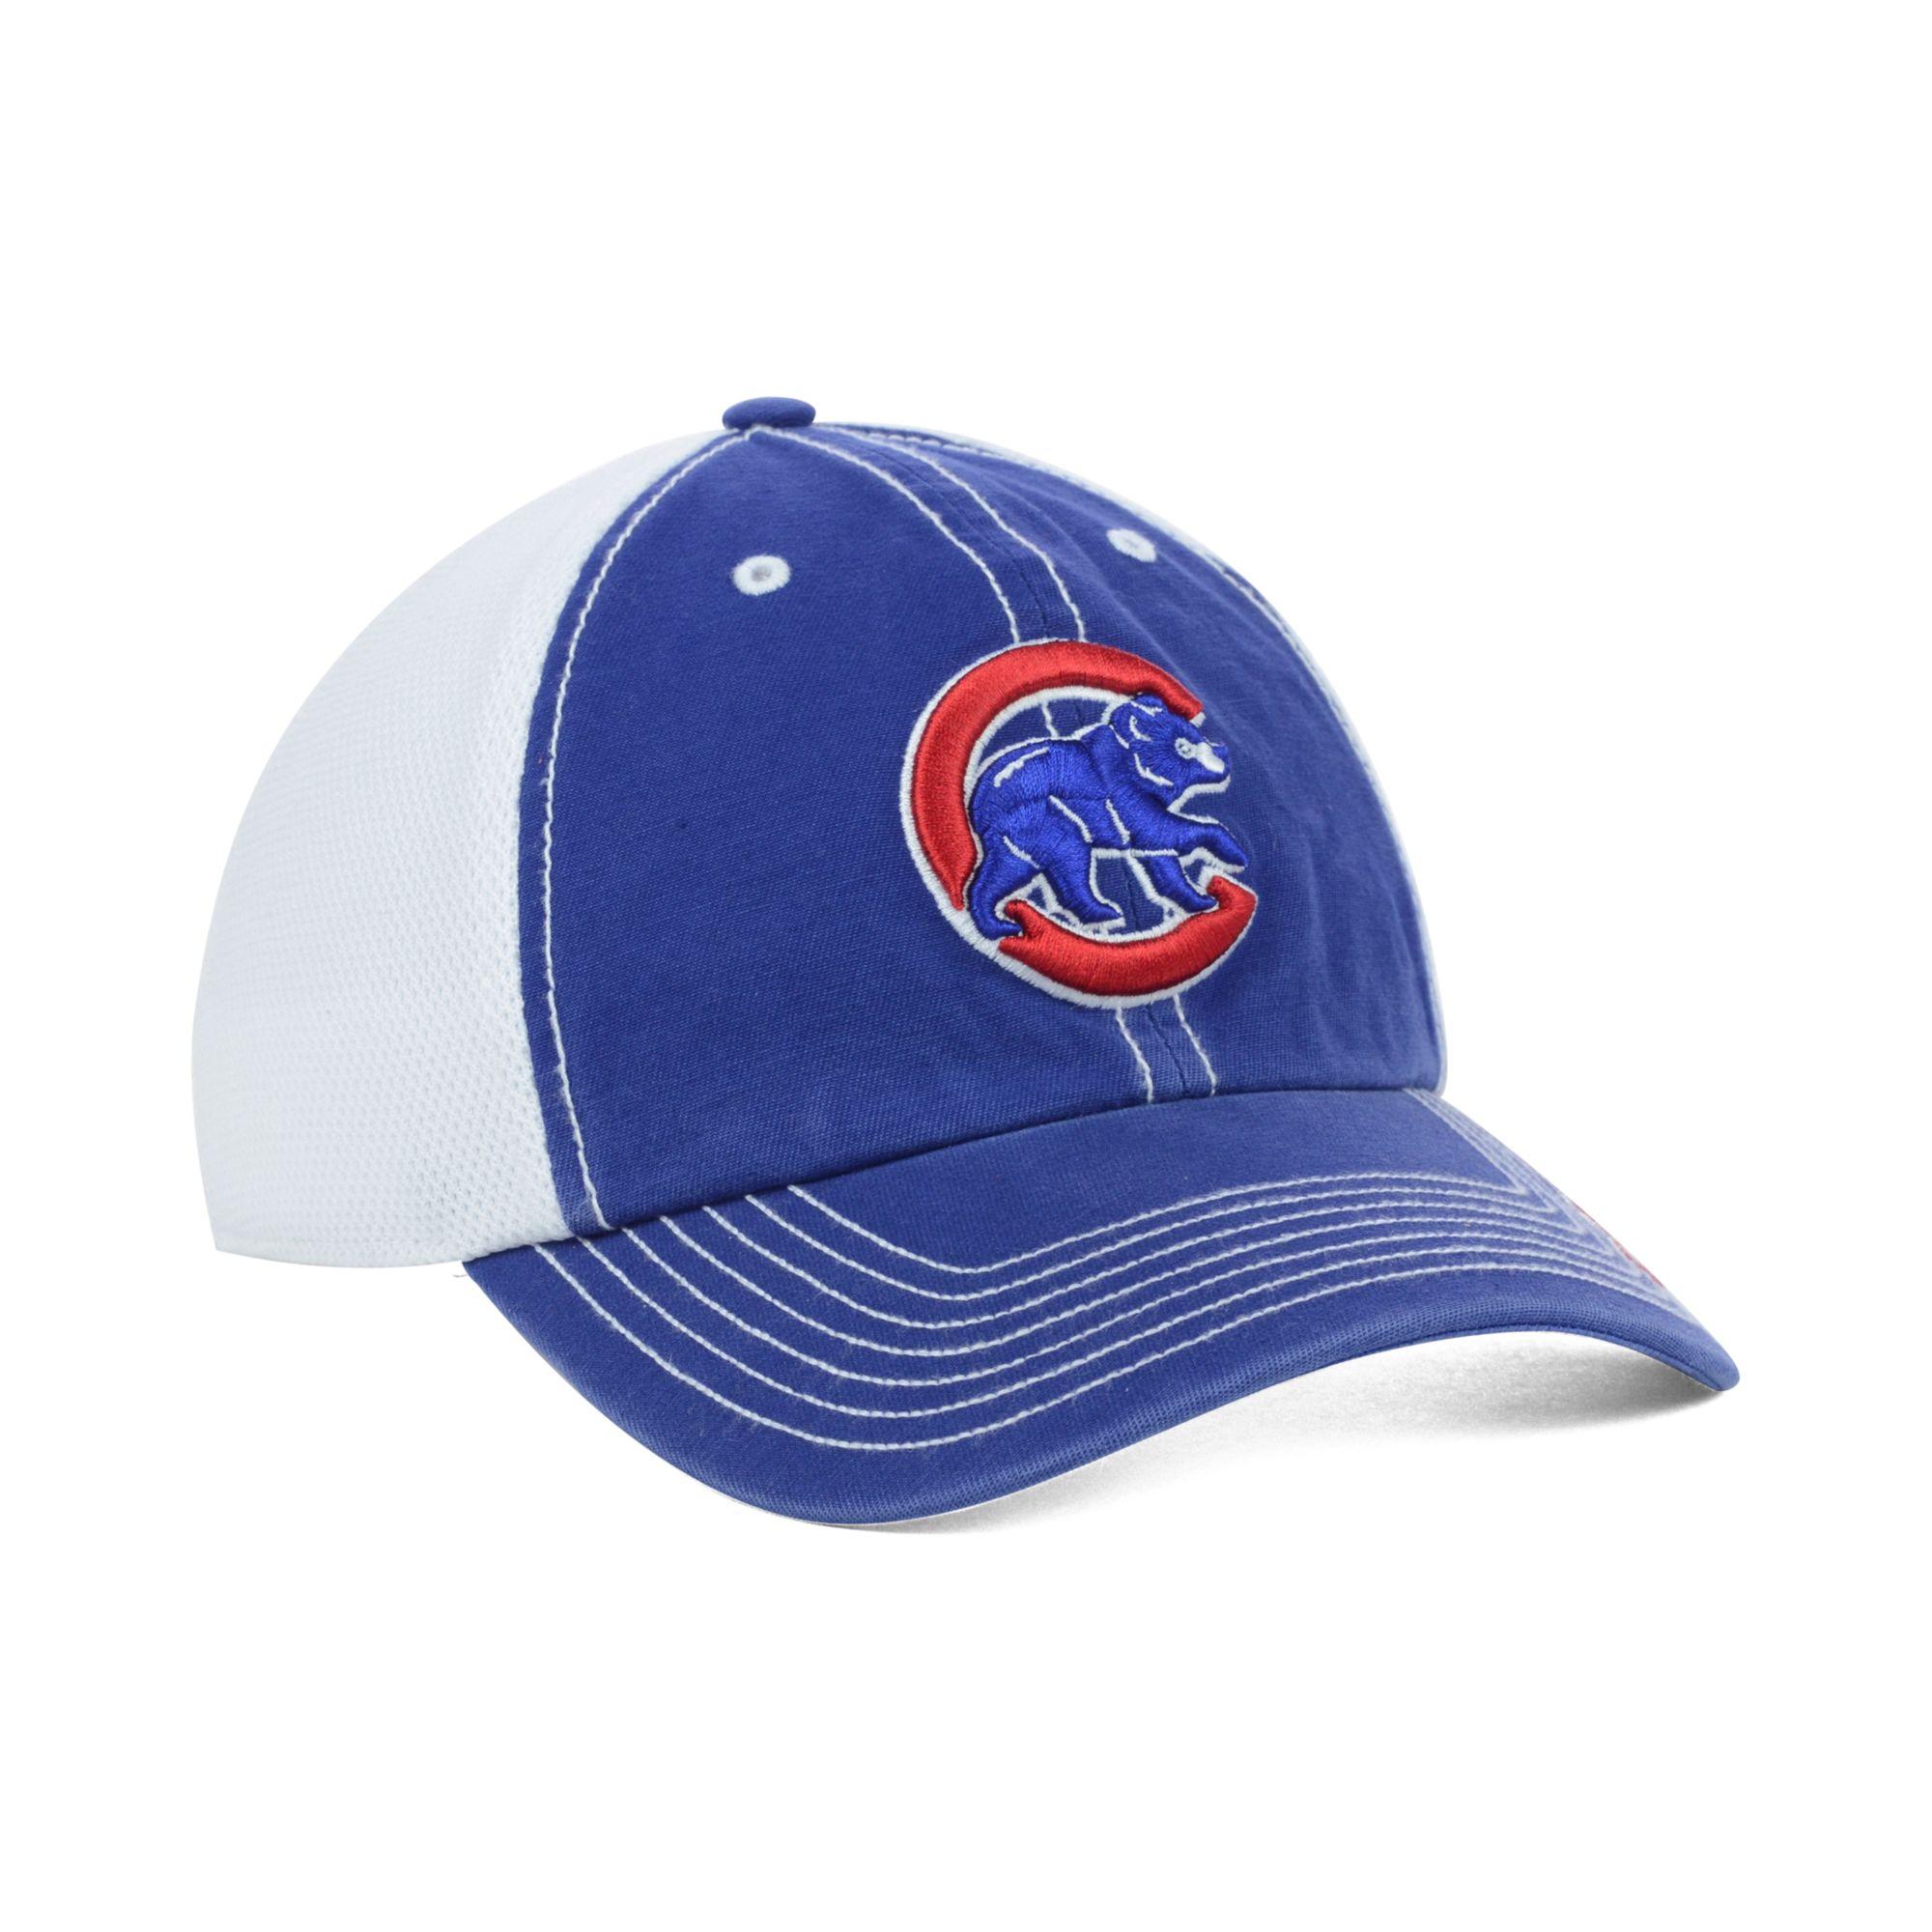 d41dd56911b08 ... new zealand lyst 47 brand chicago cubs mlb ripley cap in blue for men  e02e7 e2ce2